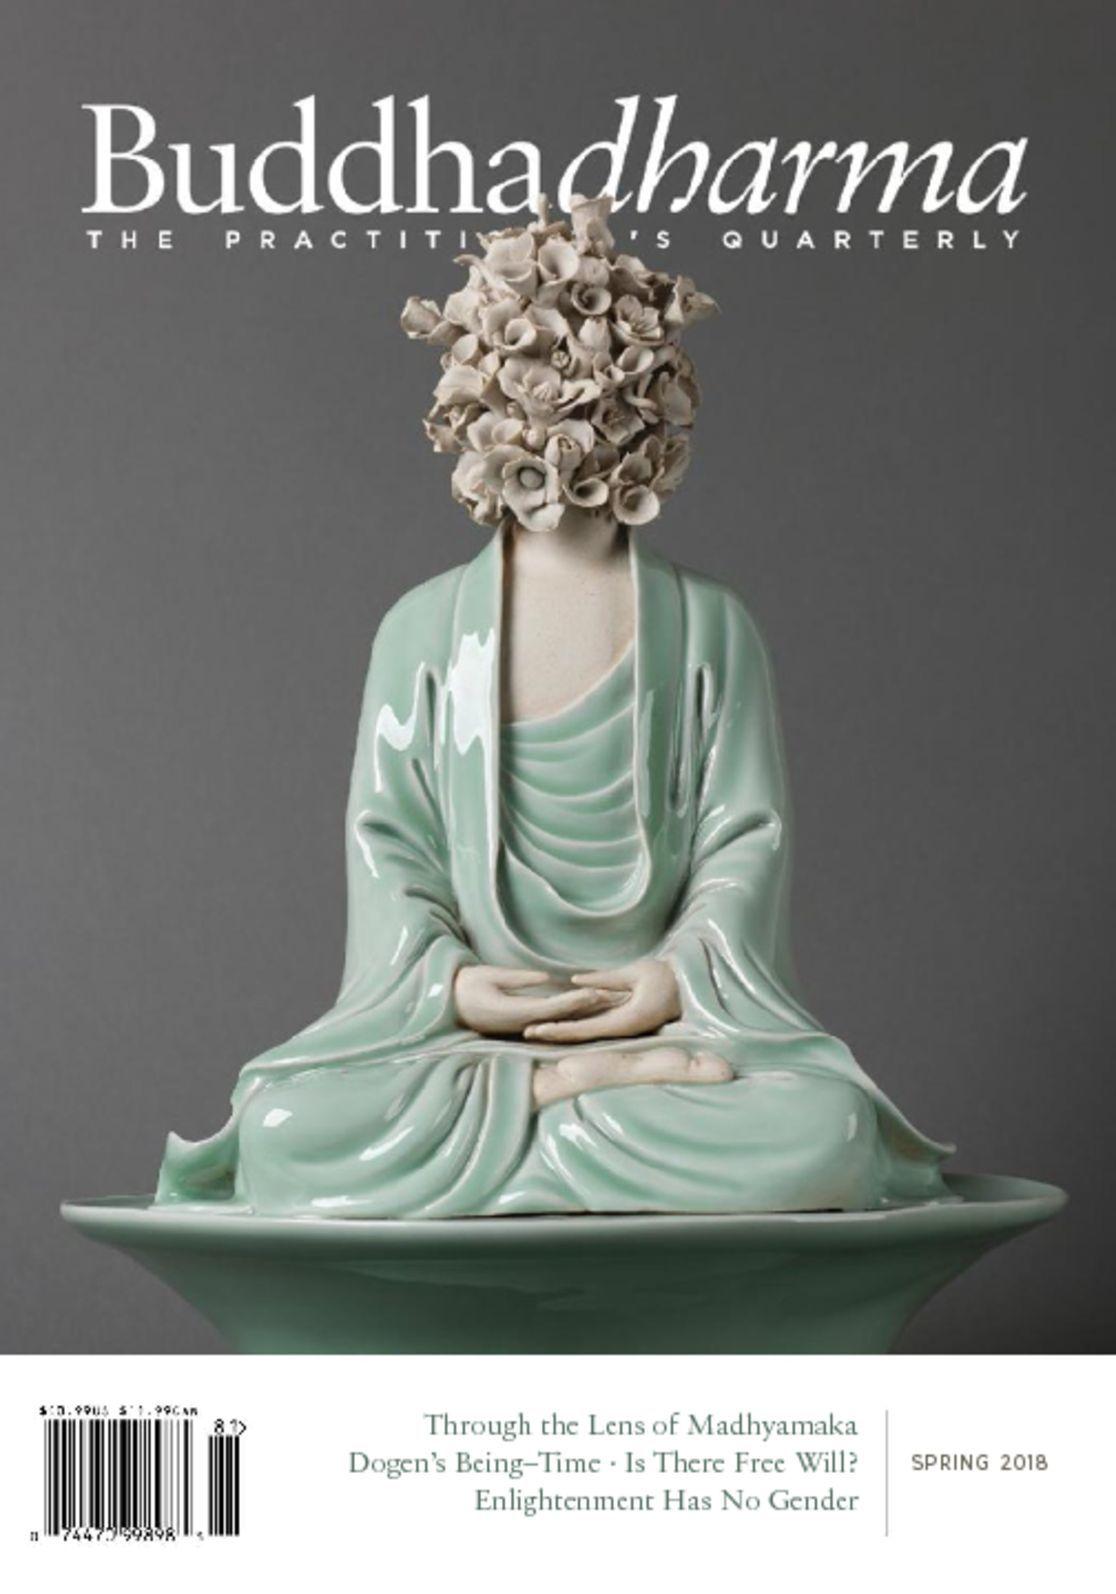 Buddhadharma The Practitioners Quarterly Digital